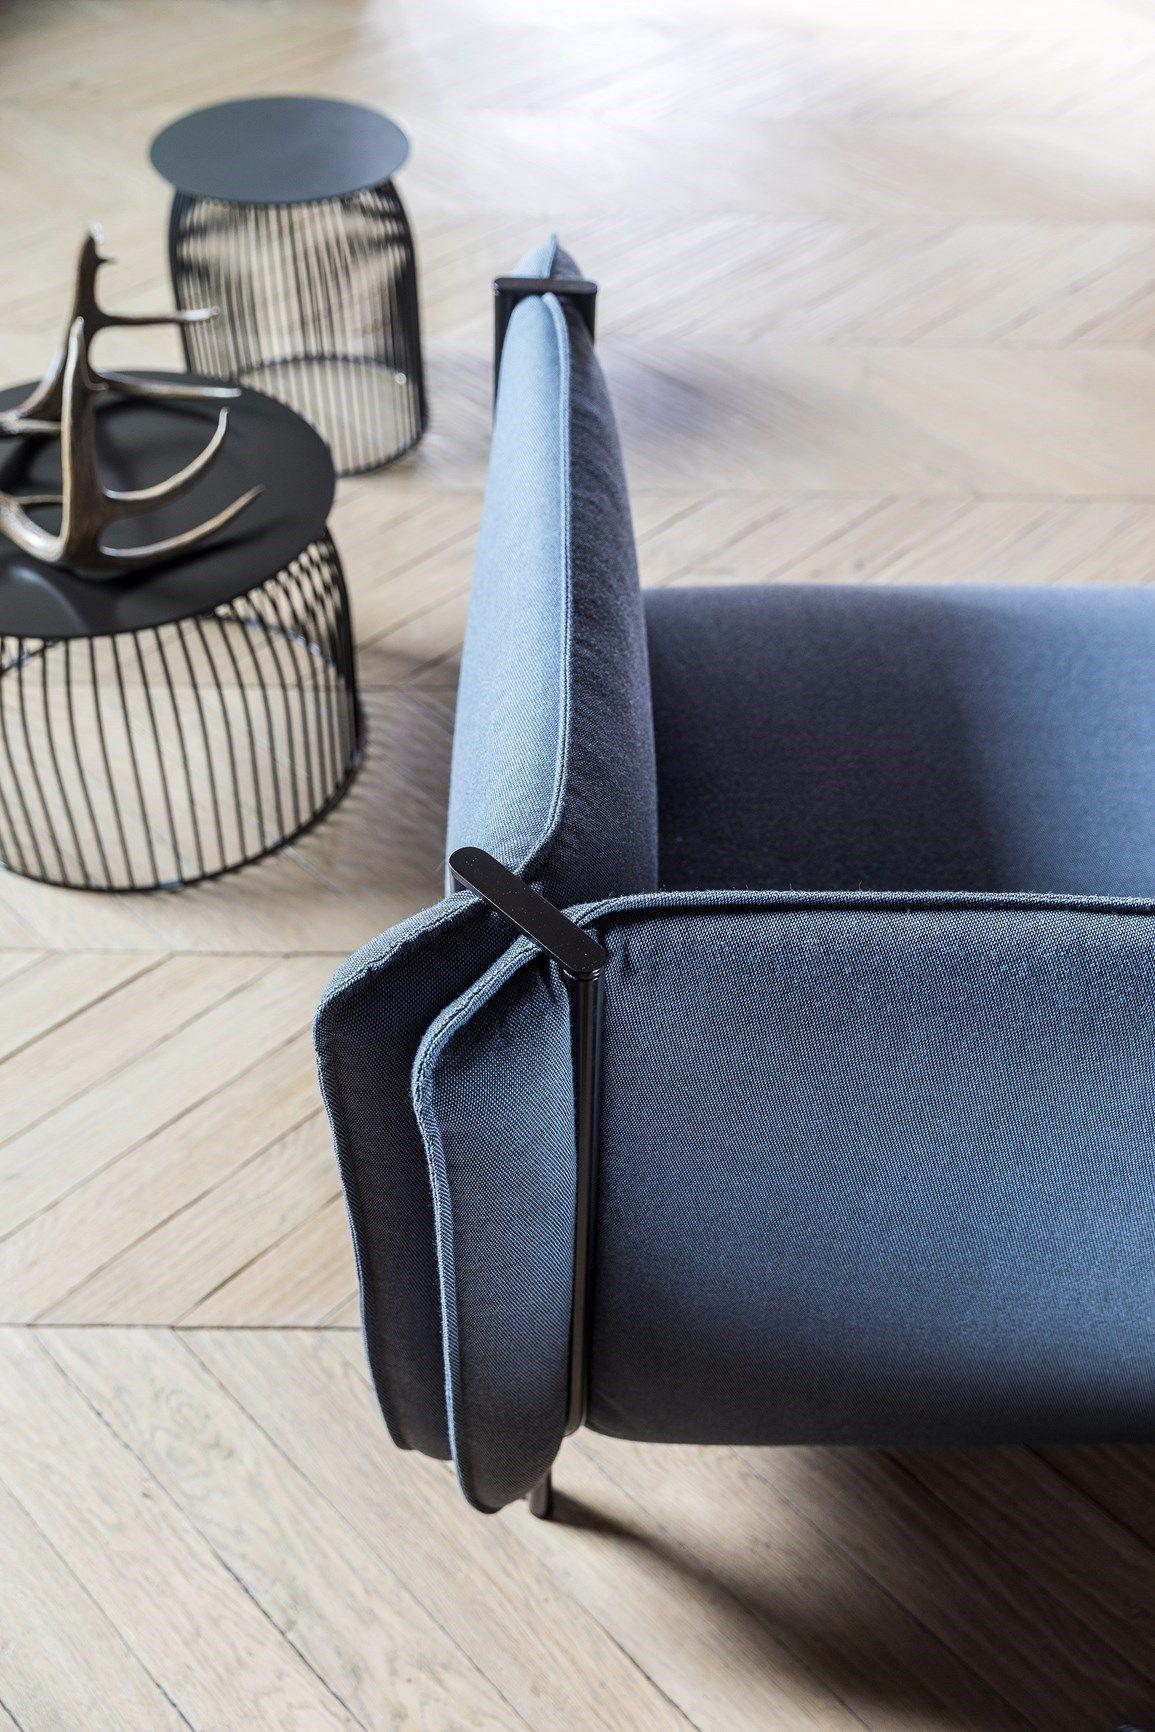 Skrivo Guisset Herkner Lacividina At Orgatec Contemporary Furniture Design Furniture Creative Furniture